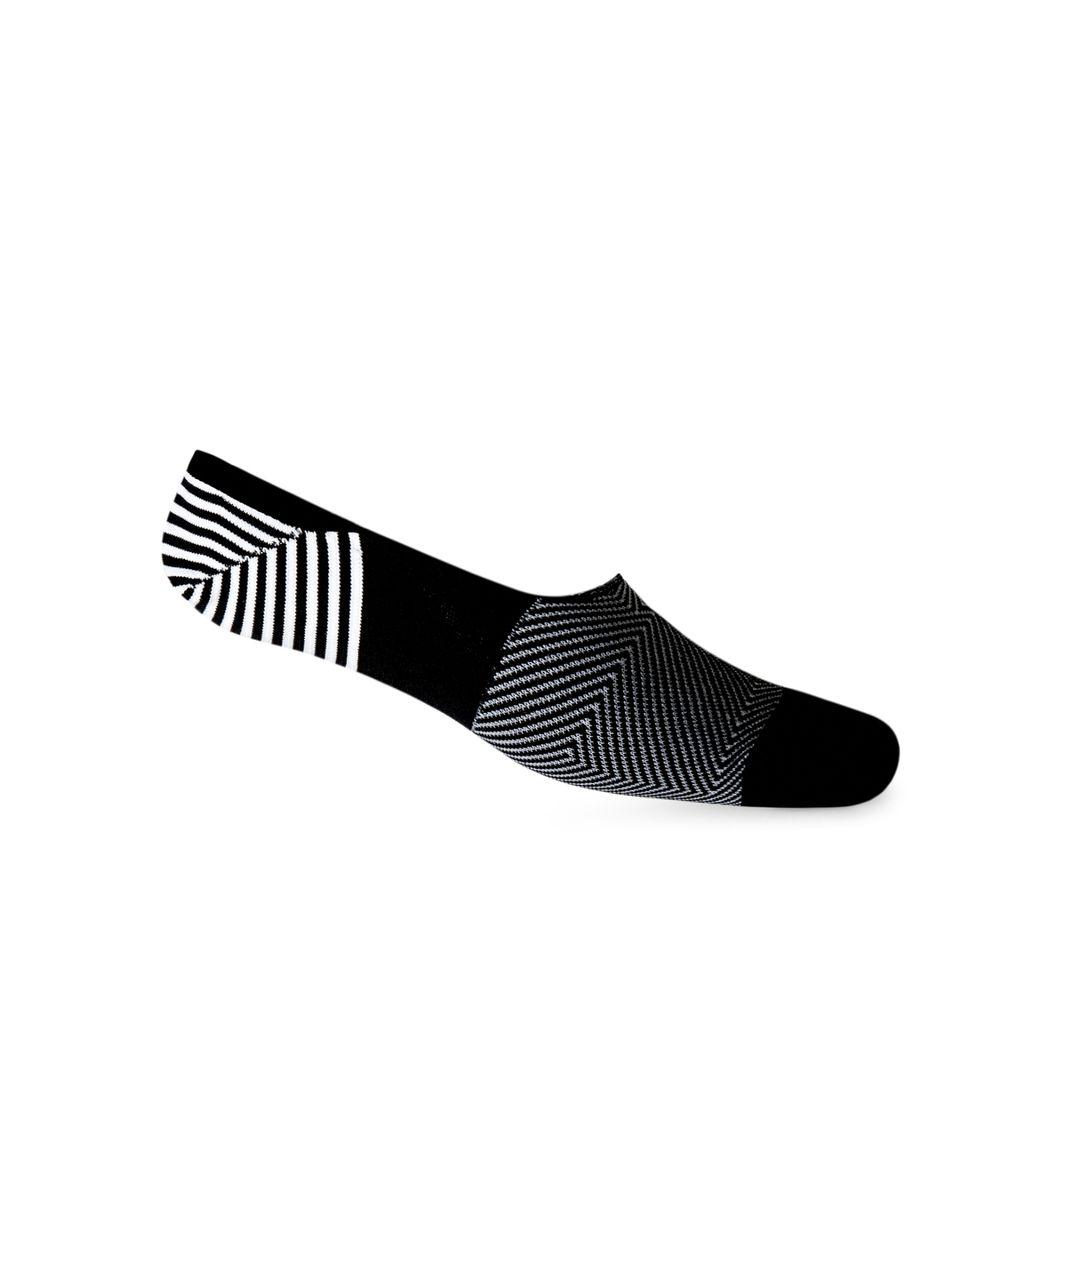 Lululemon Secret Sock - Black / White / Boom Juice